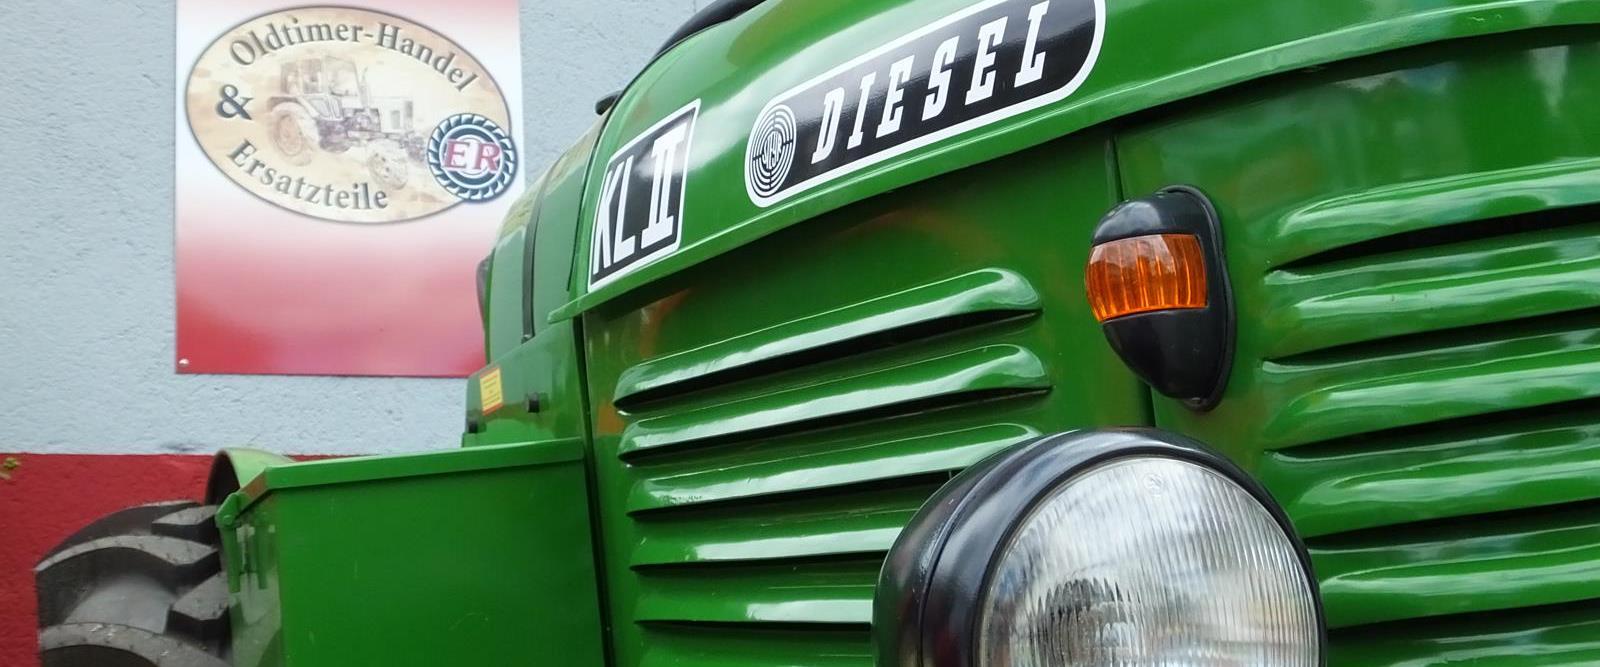 Traktoren Erstatzteile